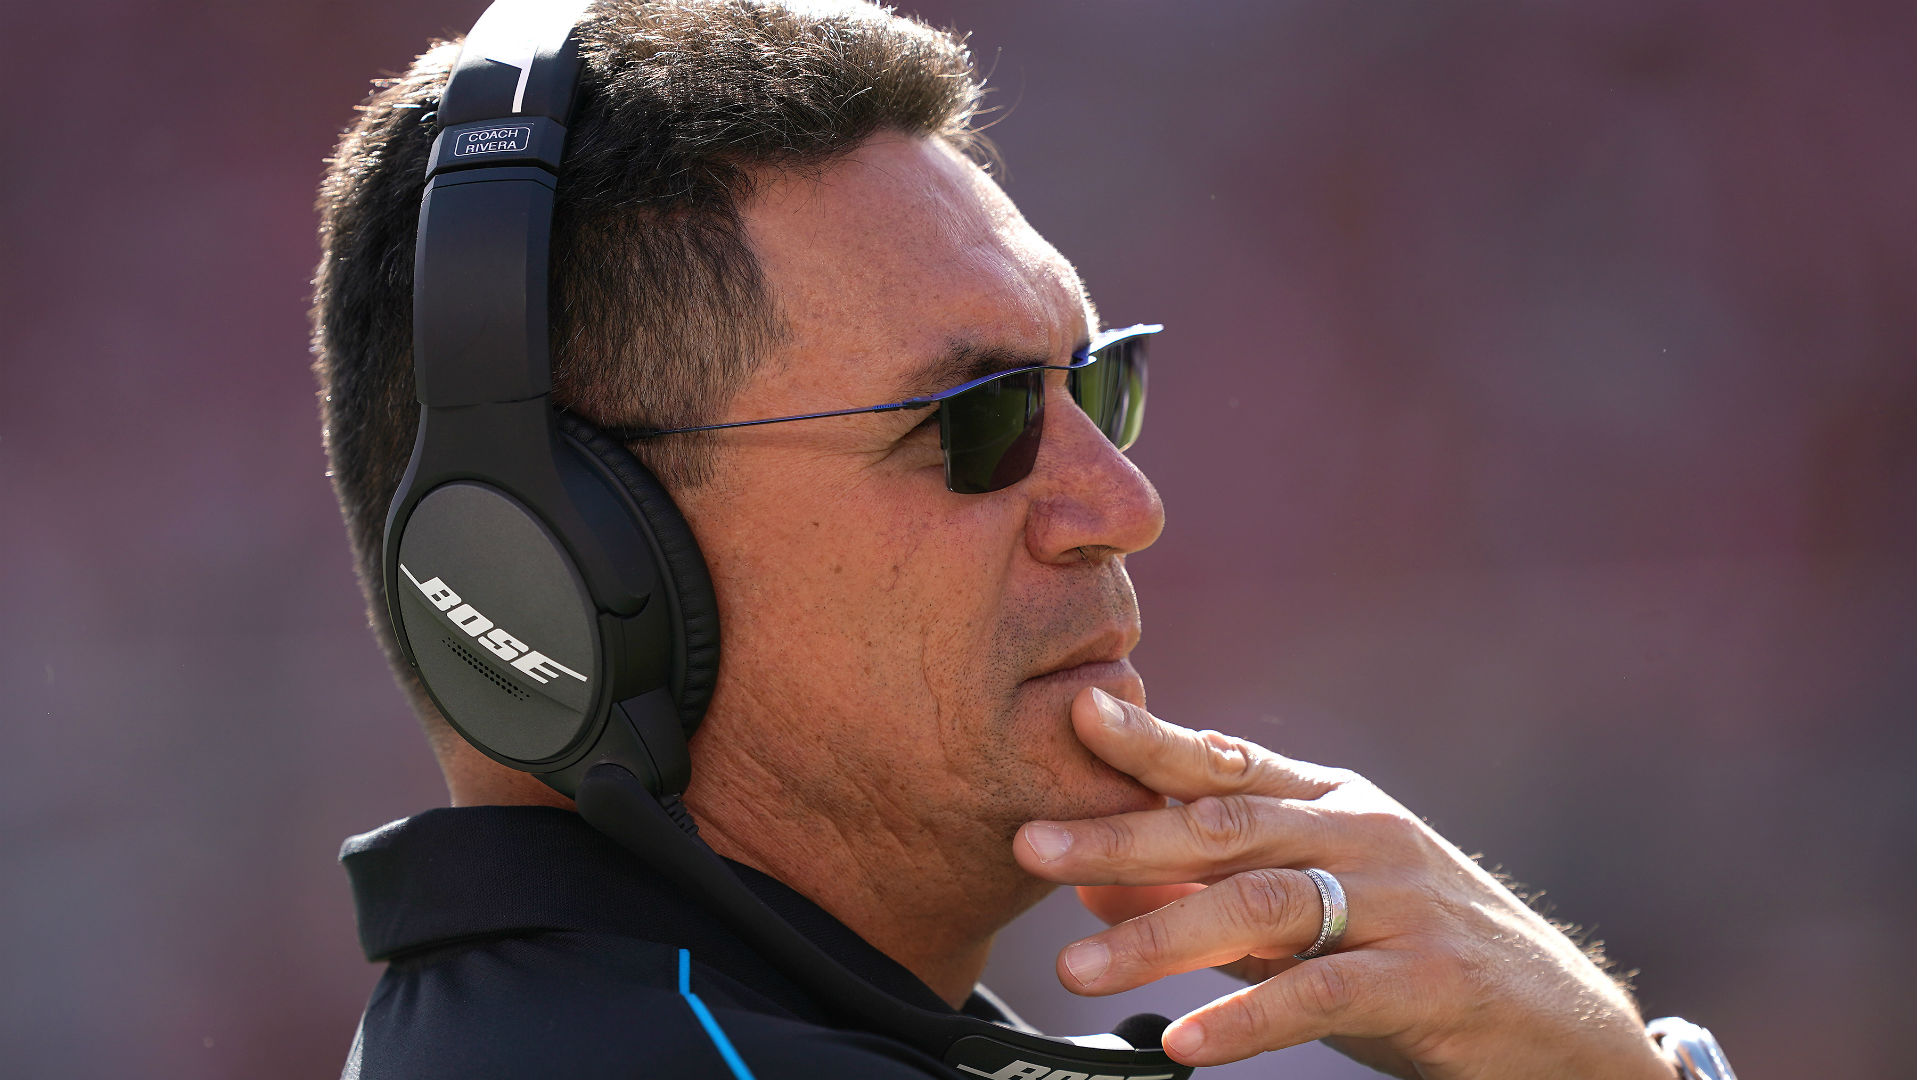 Andy Reid's coaching tree: Sean McDermott, John Harbaugh lead list of NFL success stories 5